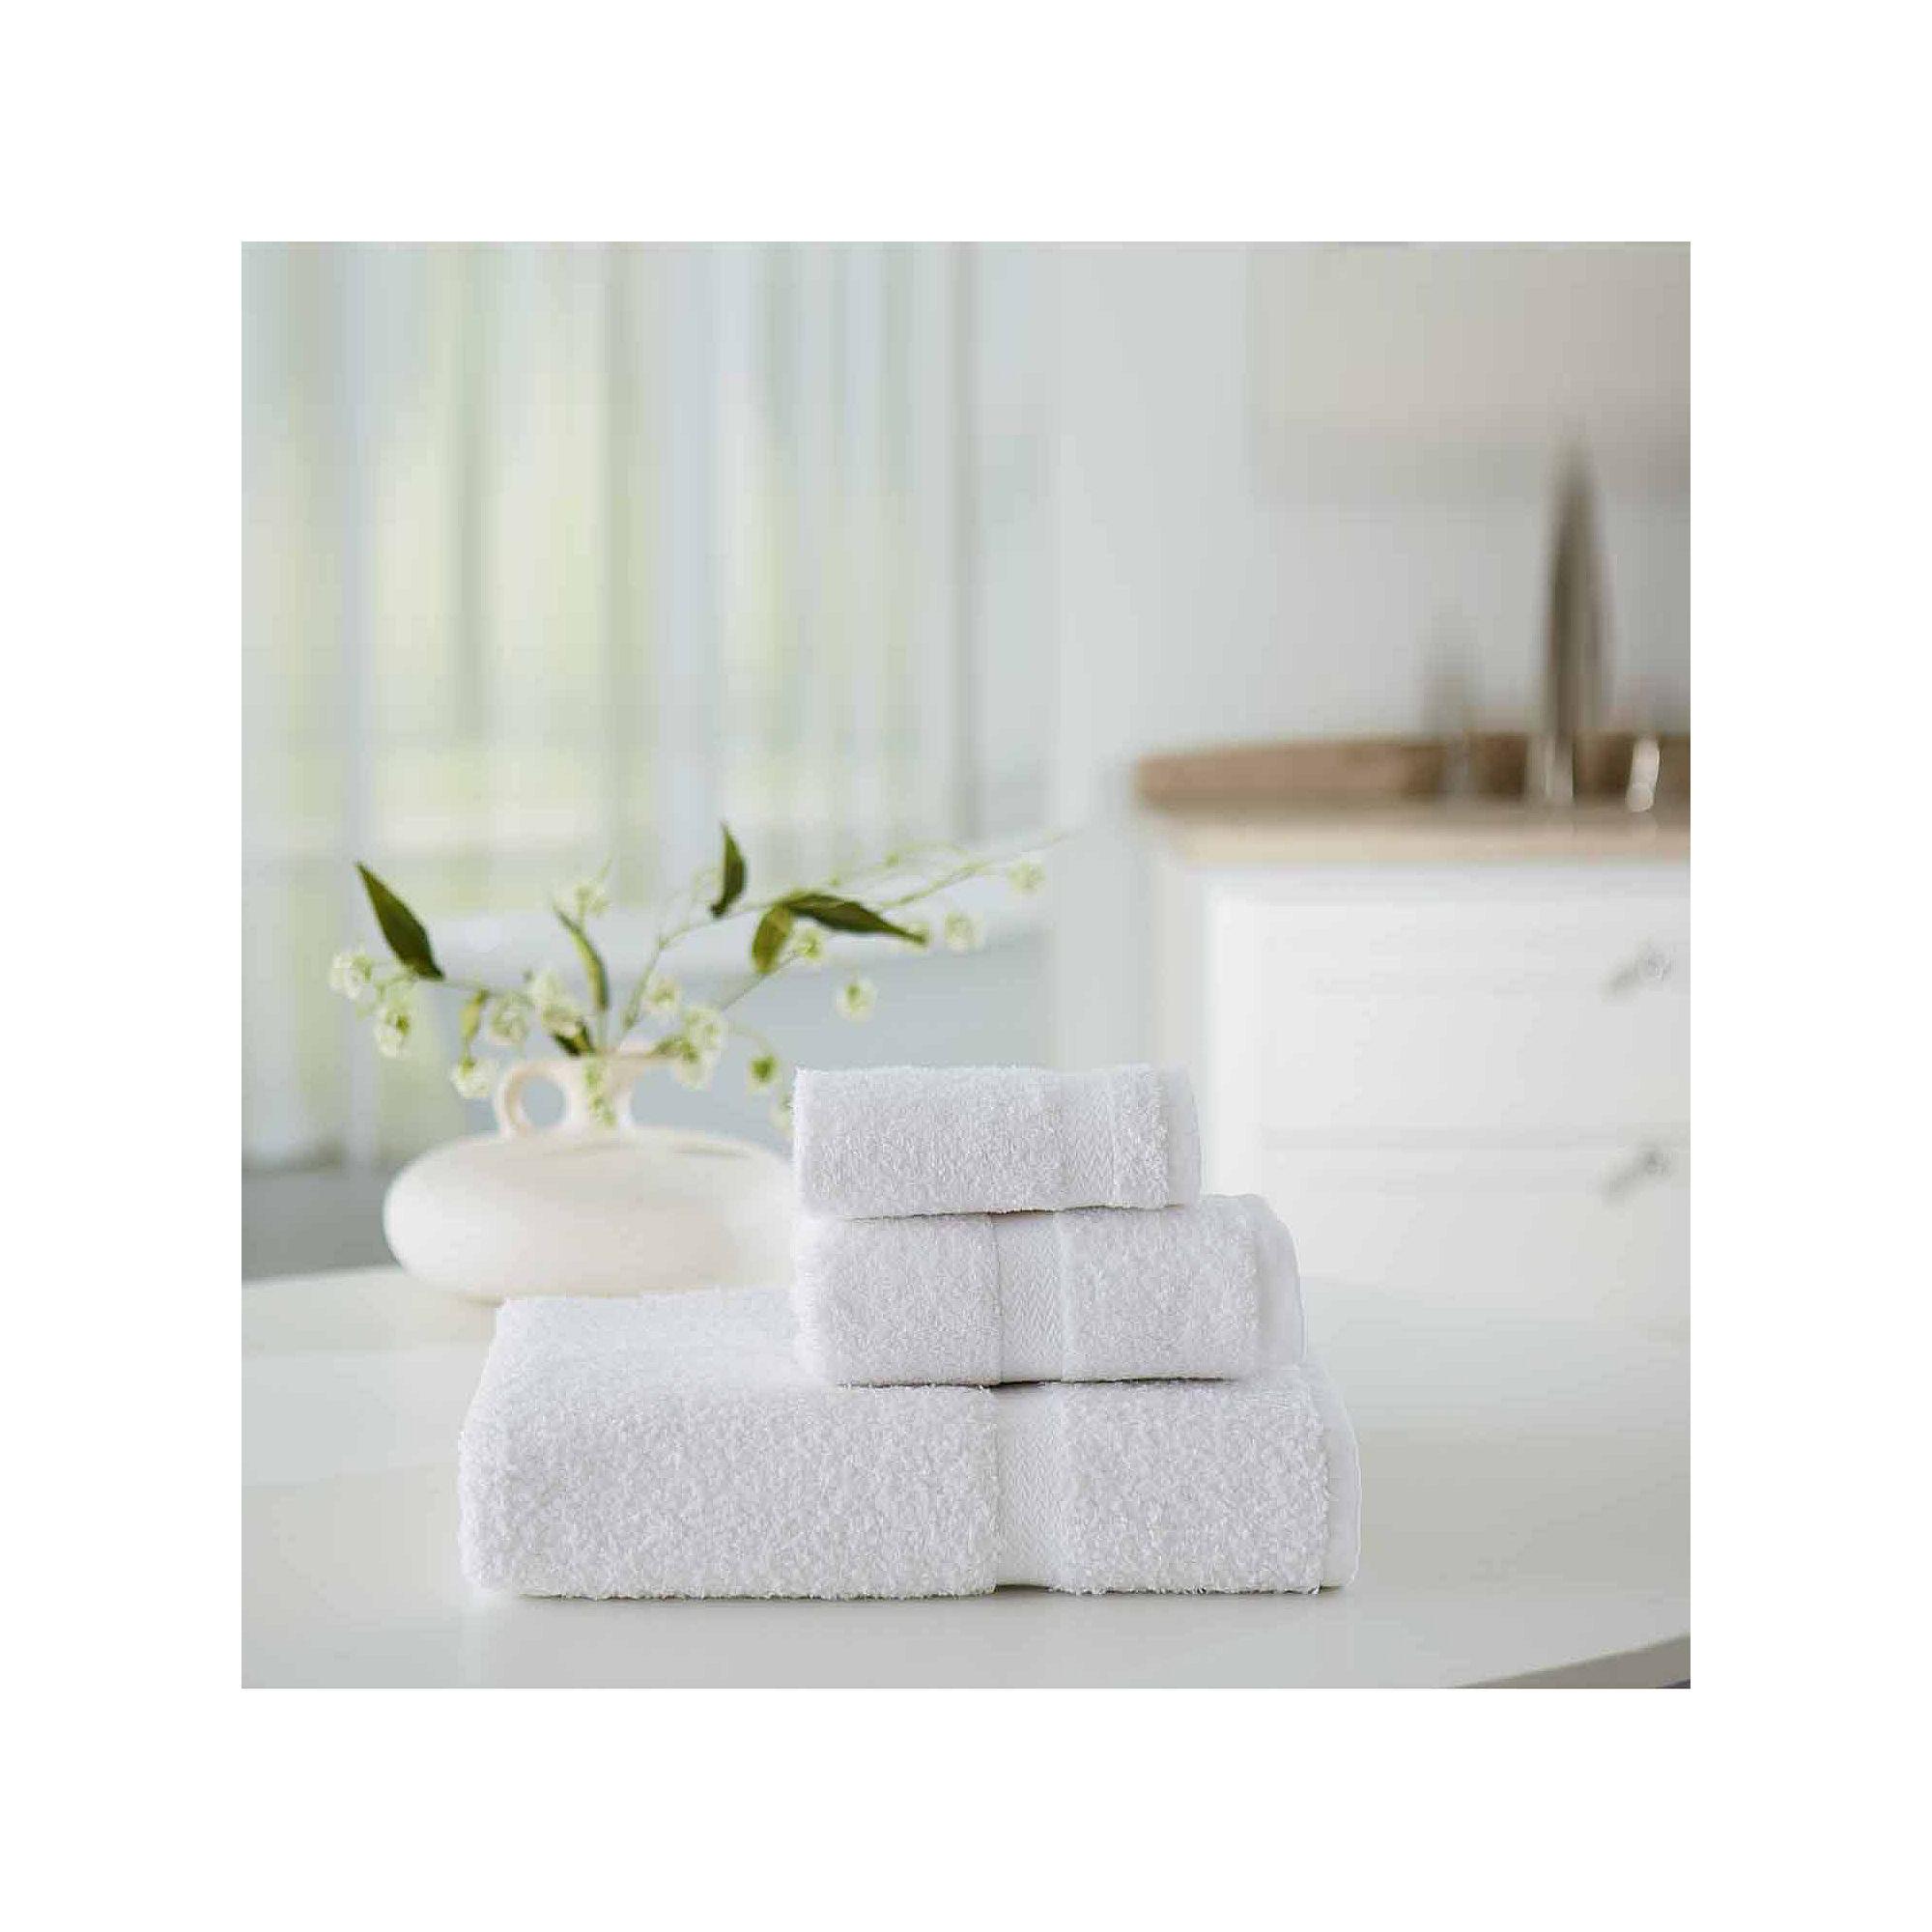 Welington 60-pc. 27x50 Bath Towel Set